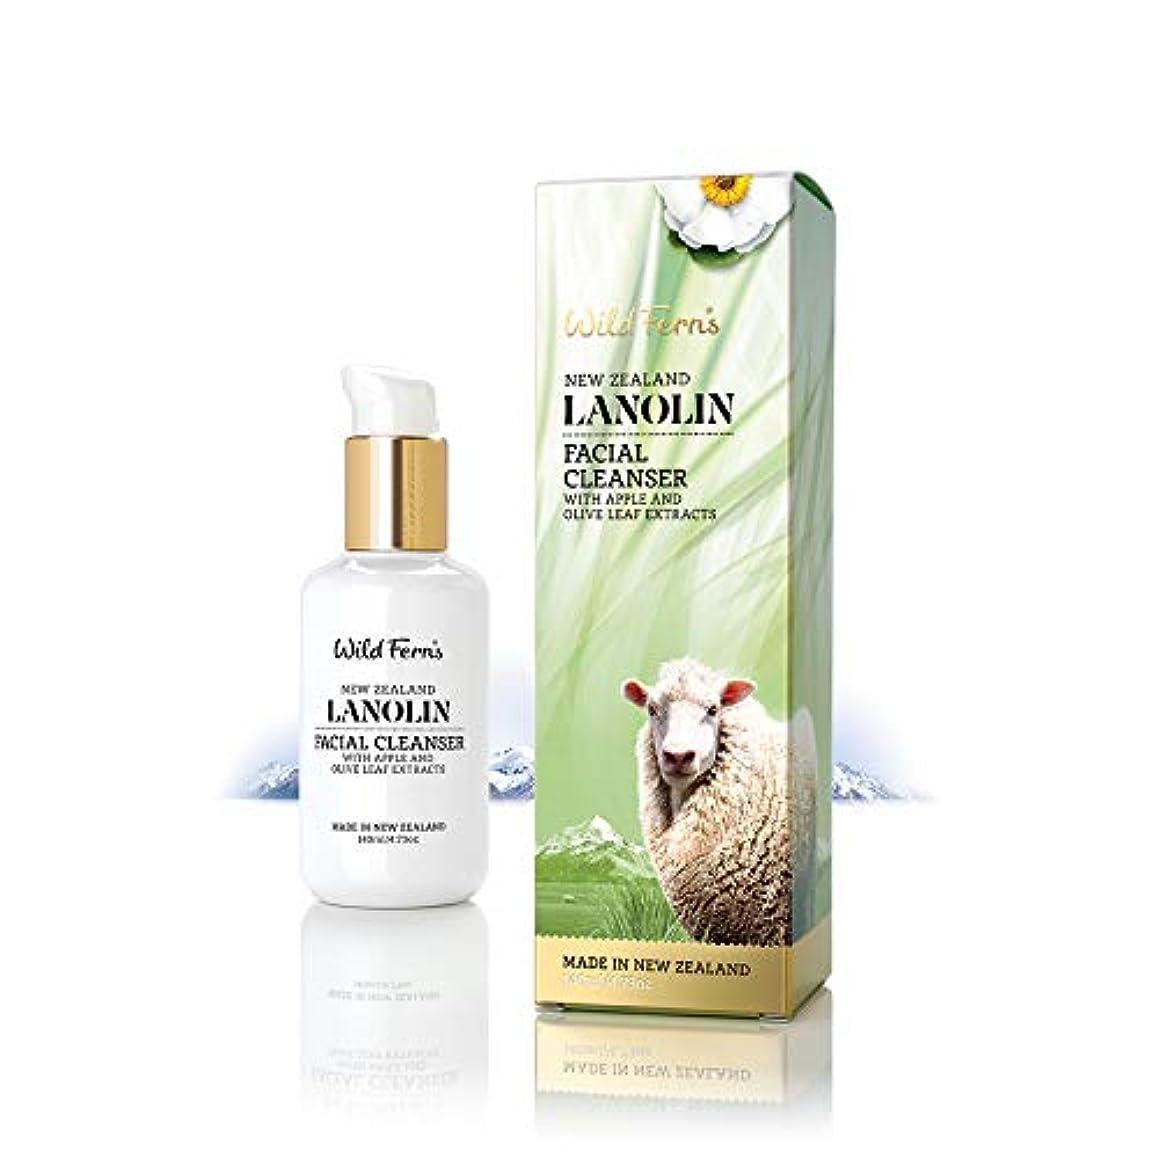 Lanolin Facial Cleanser 140ml